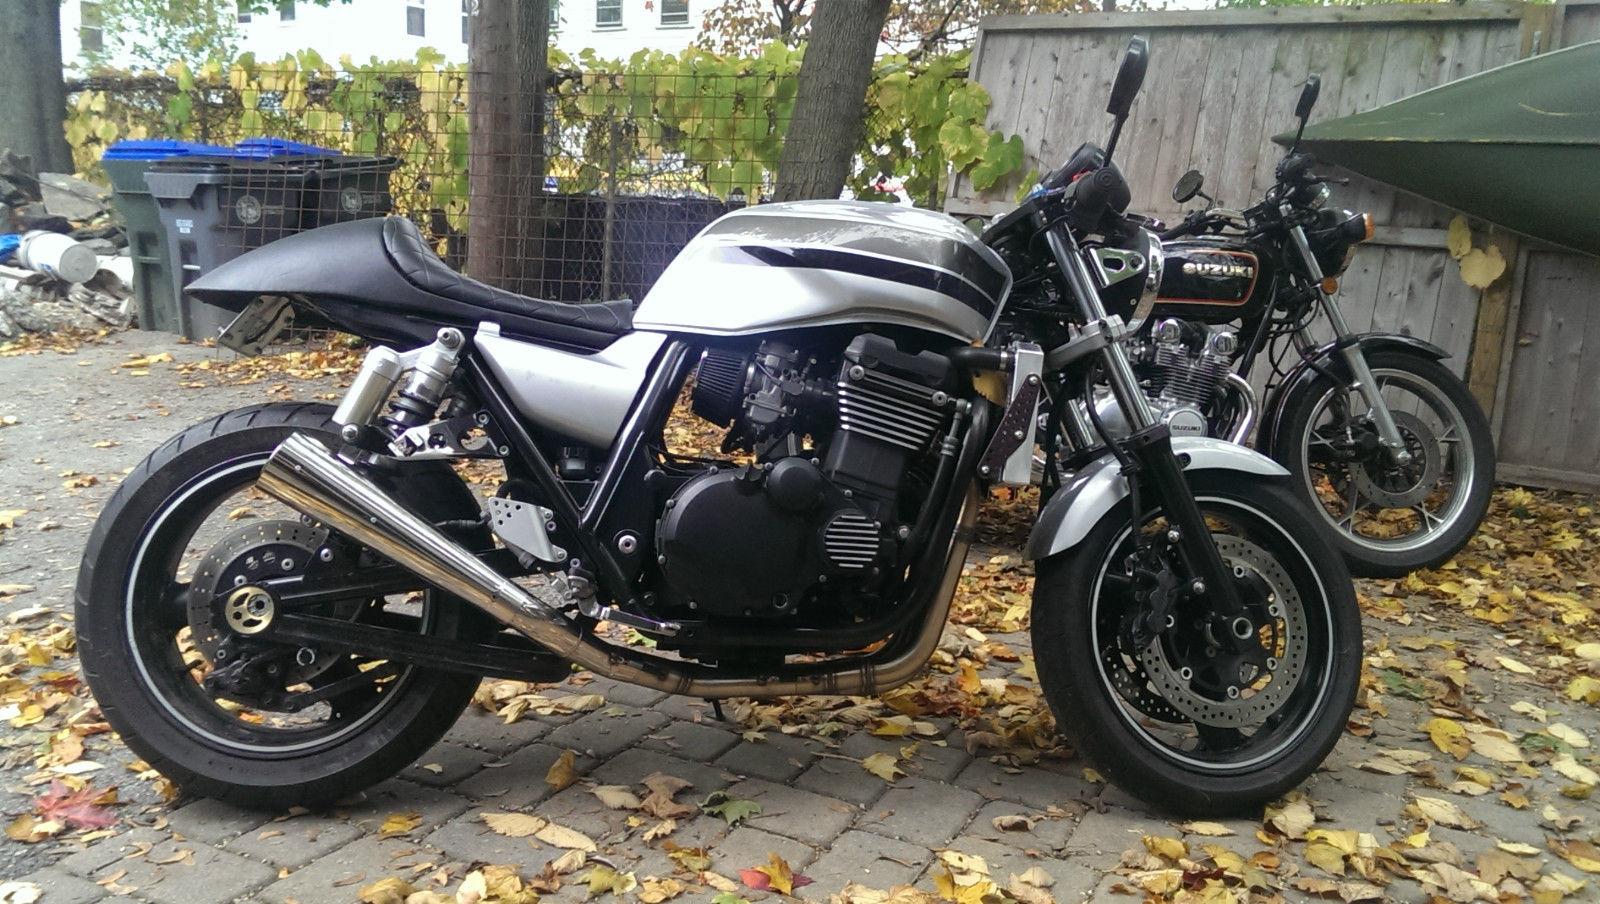 Kawasaki ZRX 1200 Cafe Racer Muscle bike Naked for sale on